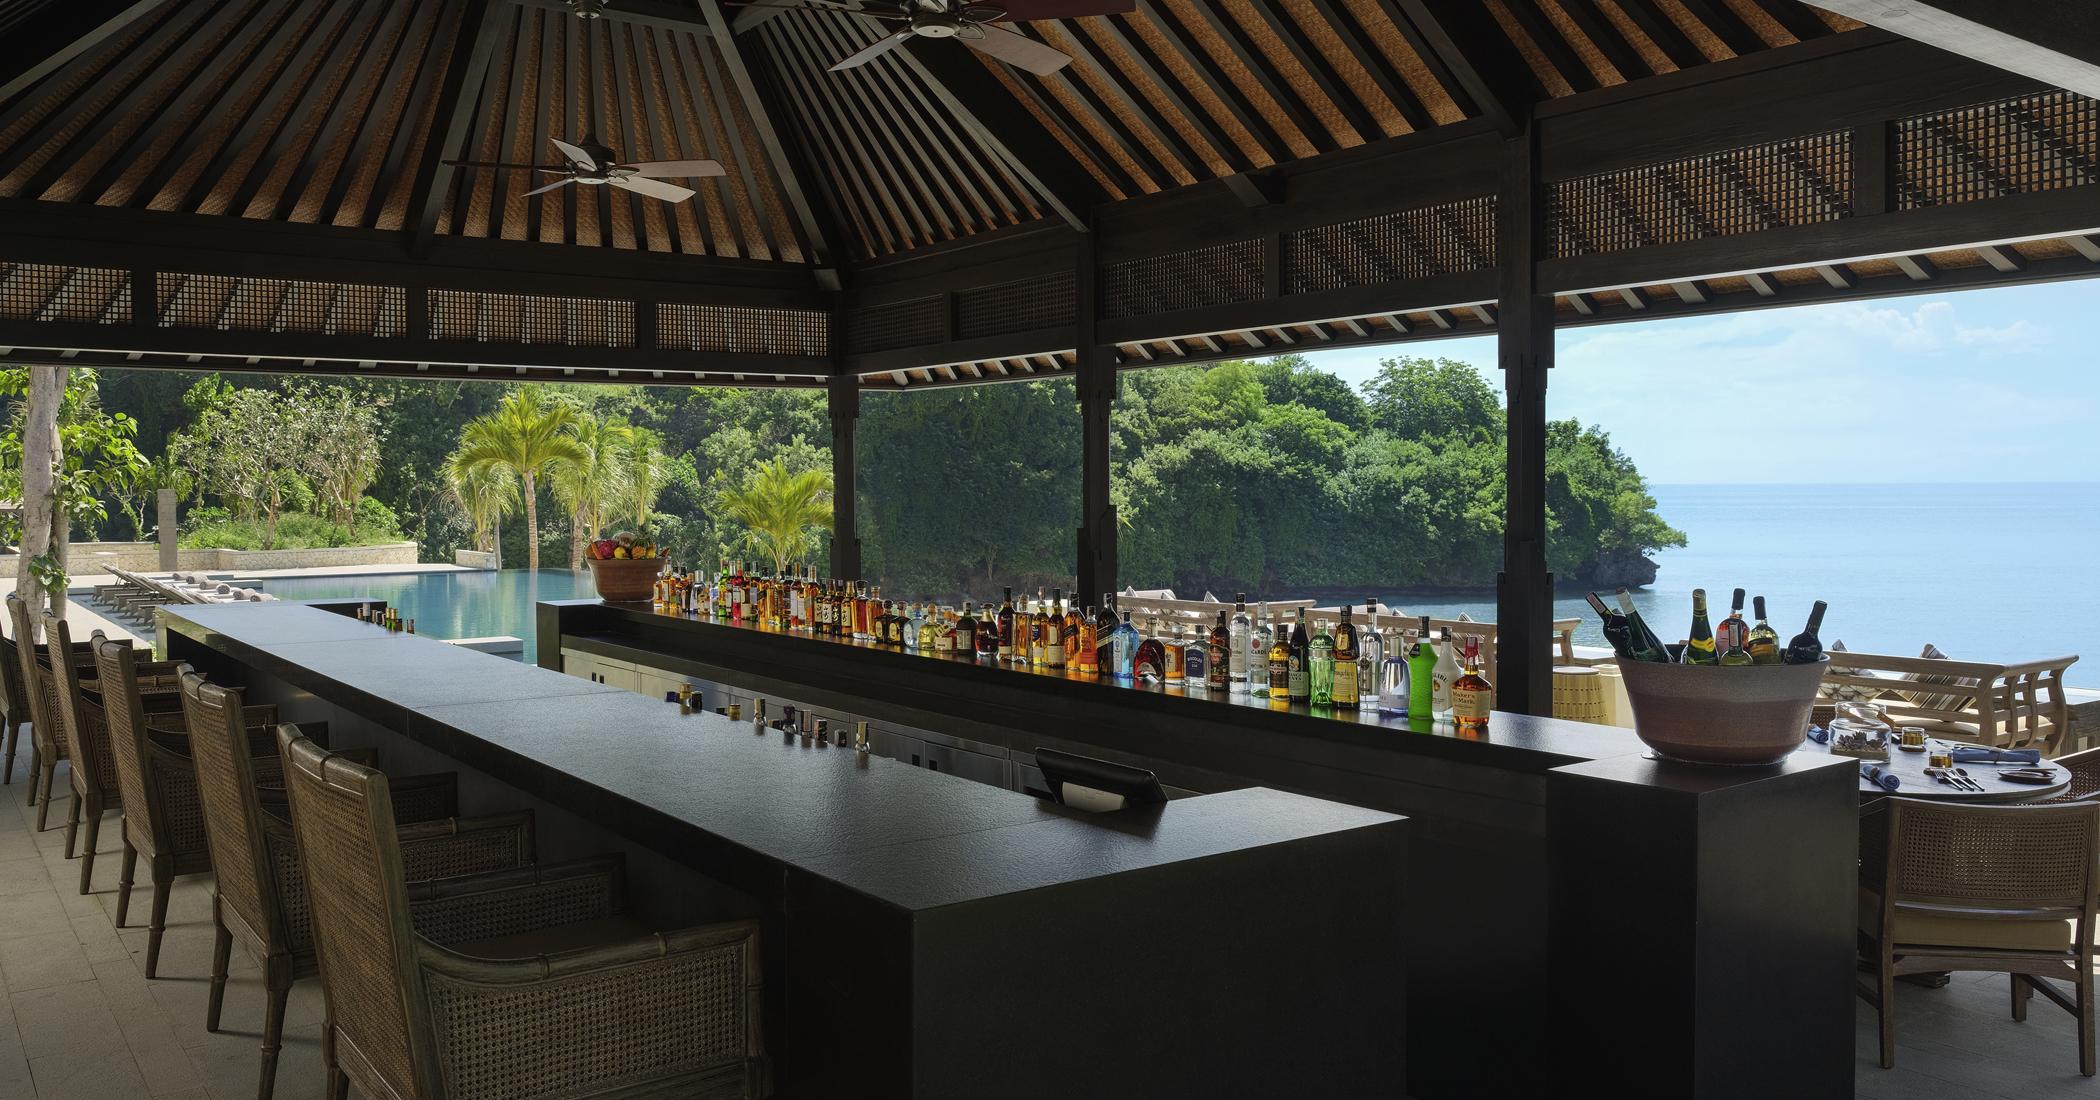 Raffles Bali - Loloan Beach Bar and Grill